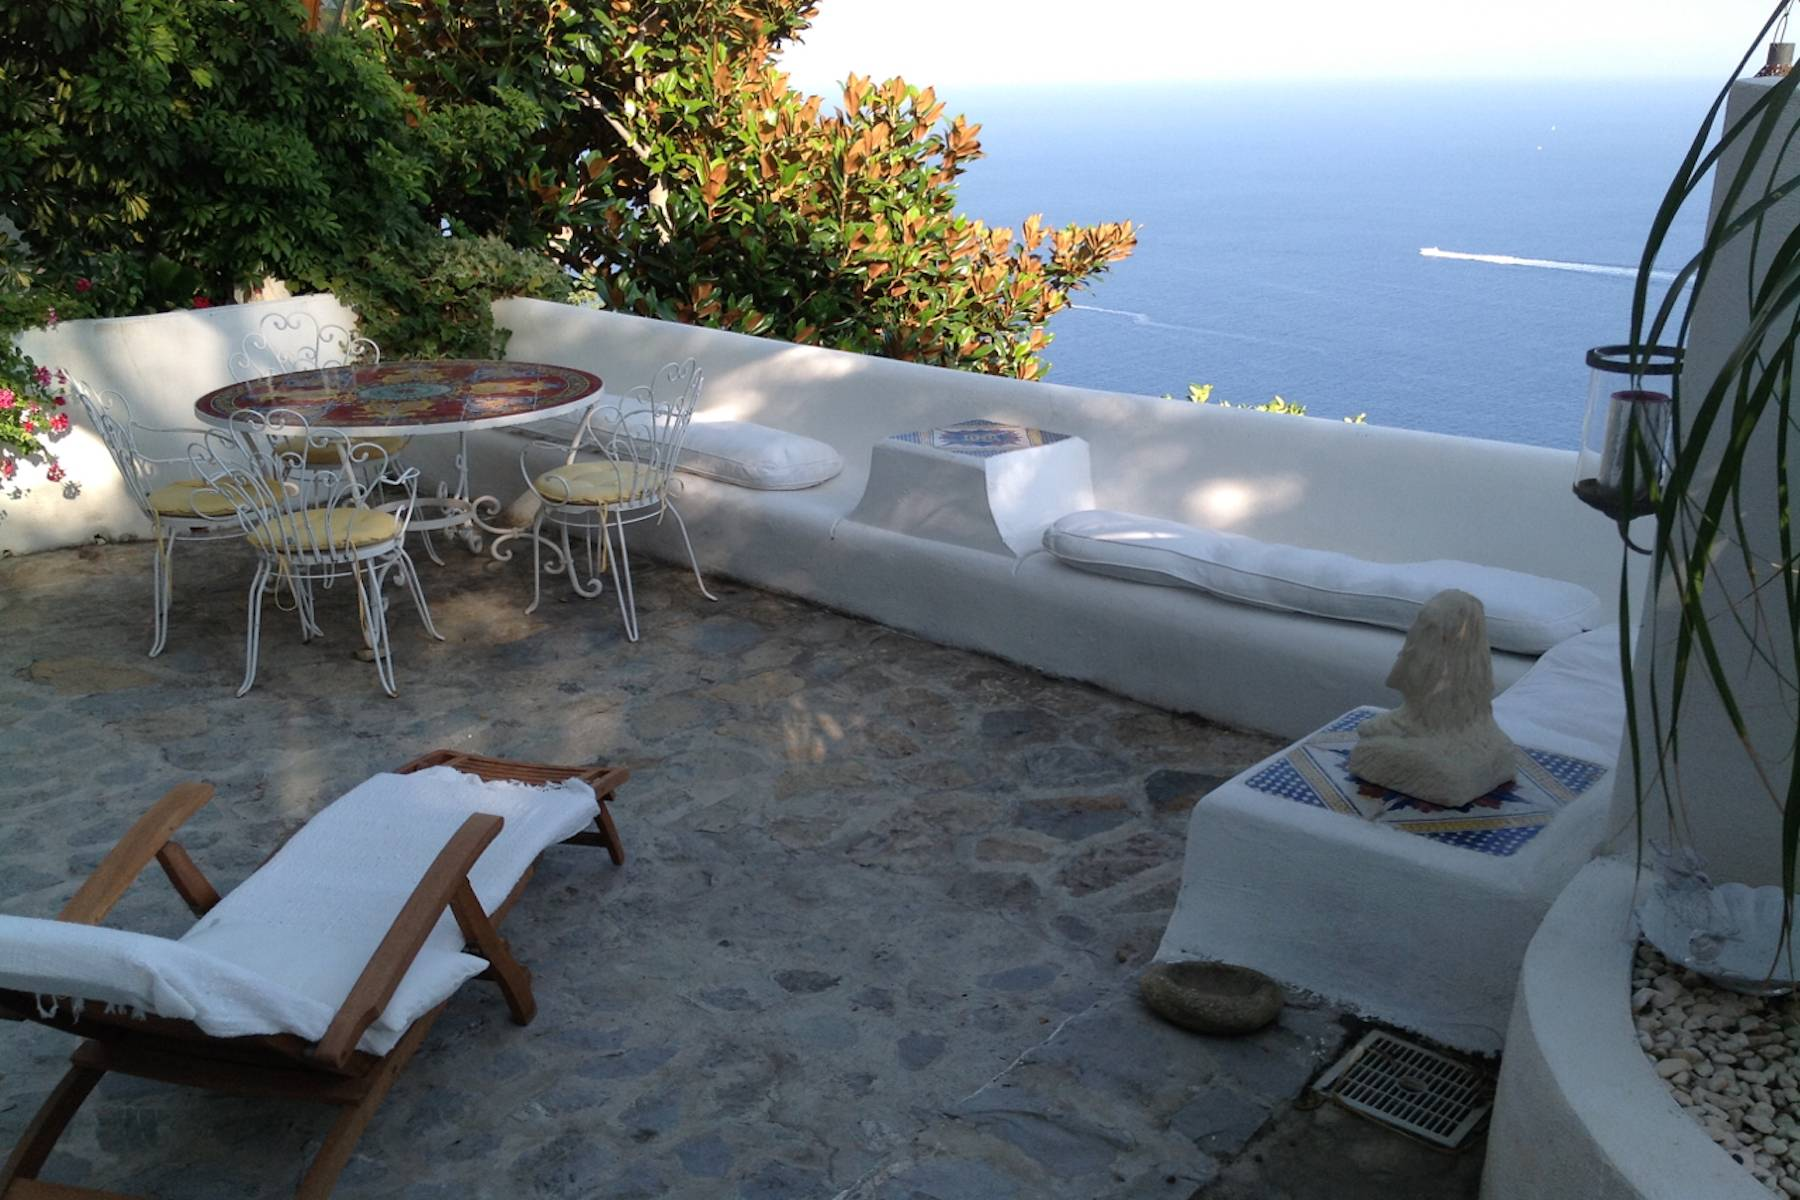 Casa indipendente in Vendita a Praiano: 4 locali, 250 mq - Foto 27